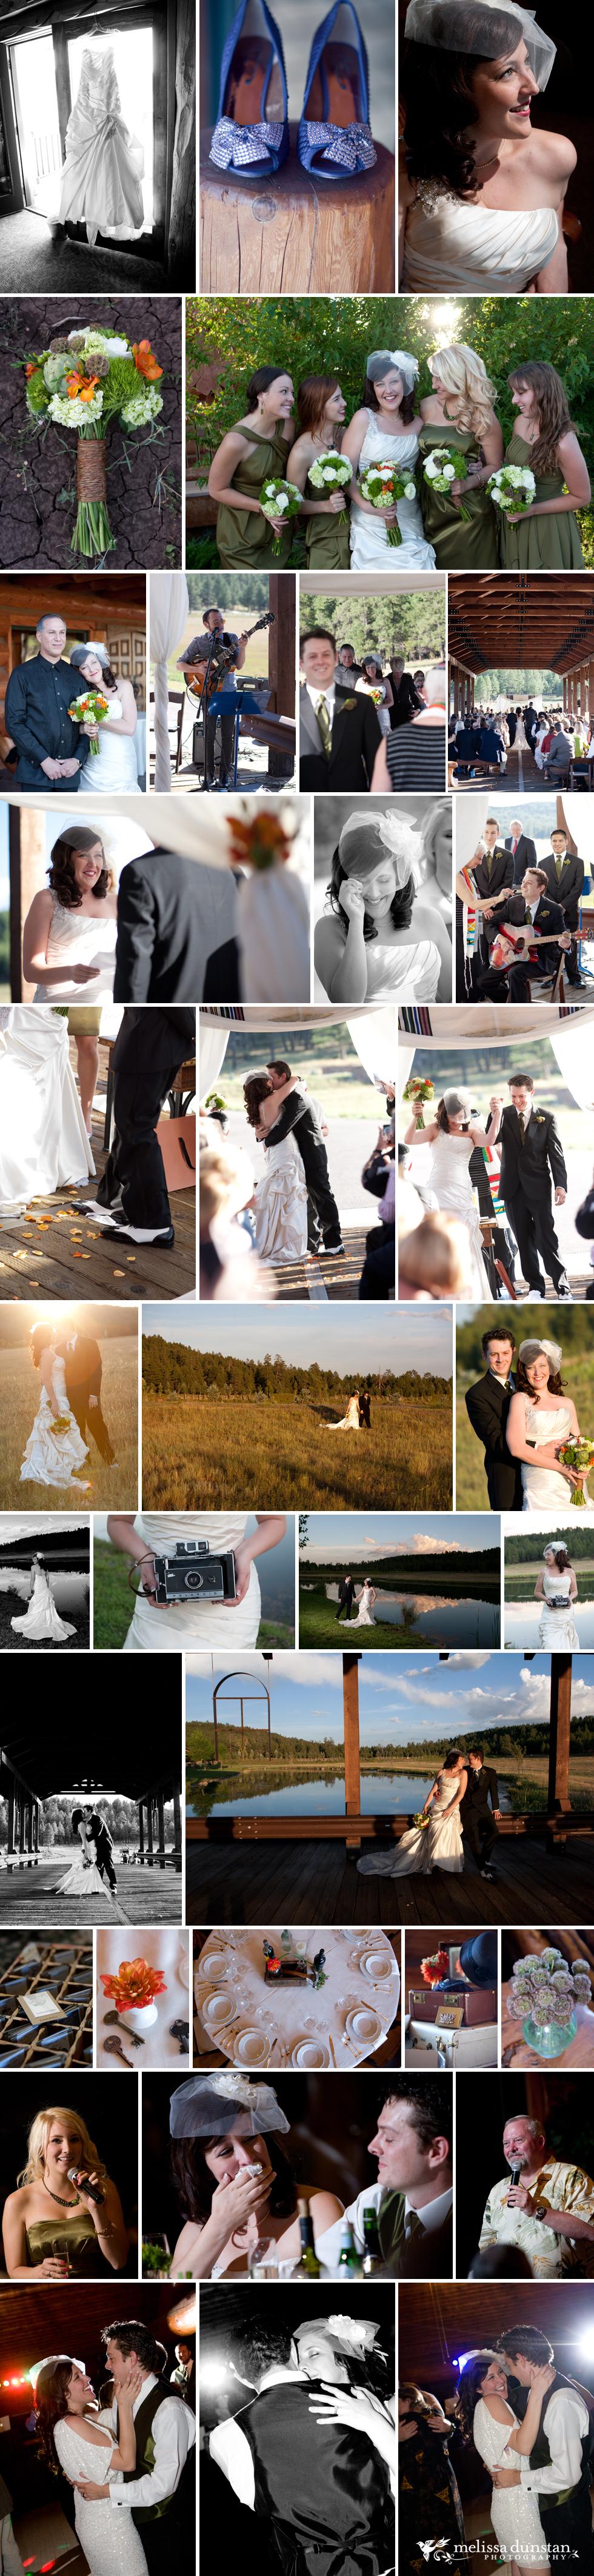 Flagstaff Wedding Photographer_Sedona_Scottsdale_Hawaii_Lake Tahoe_New Orleans